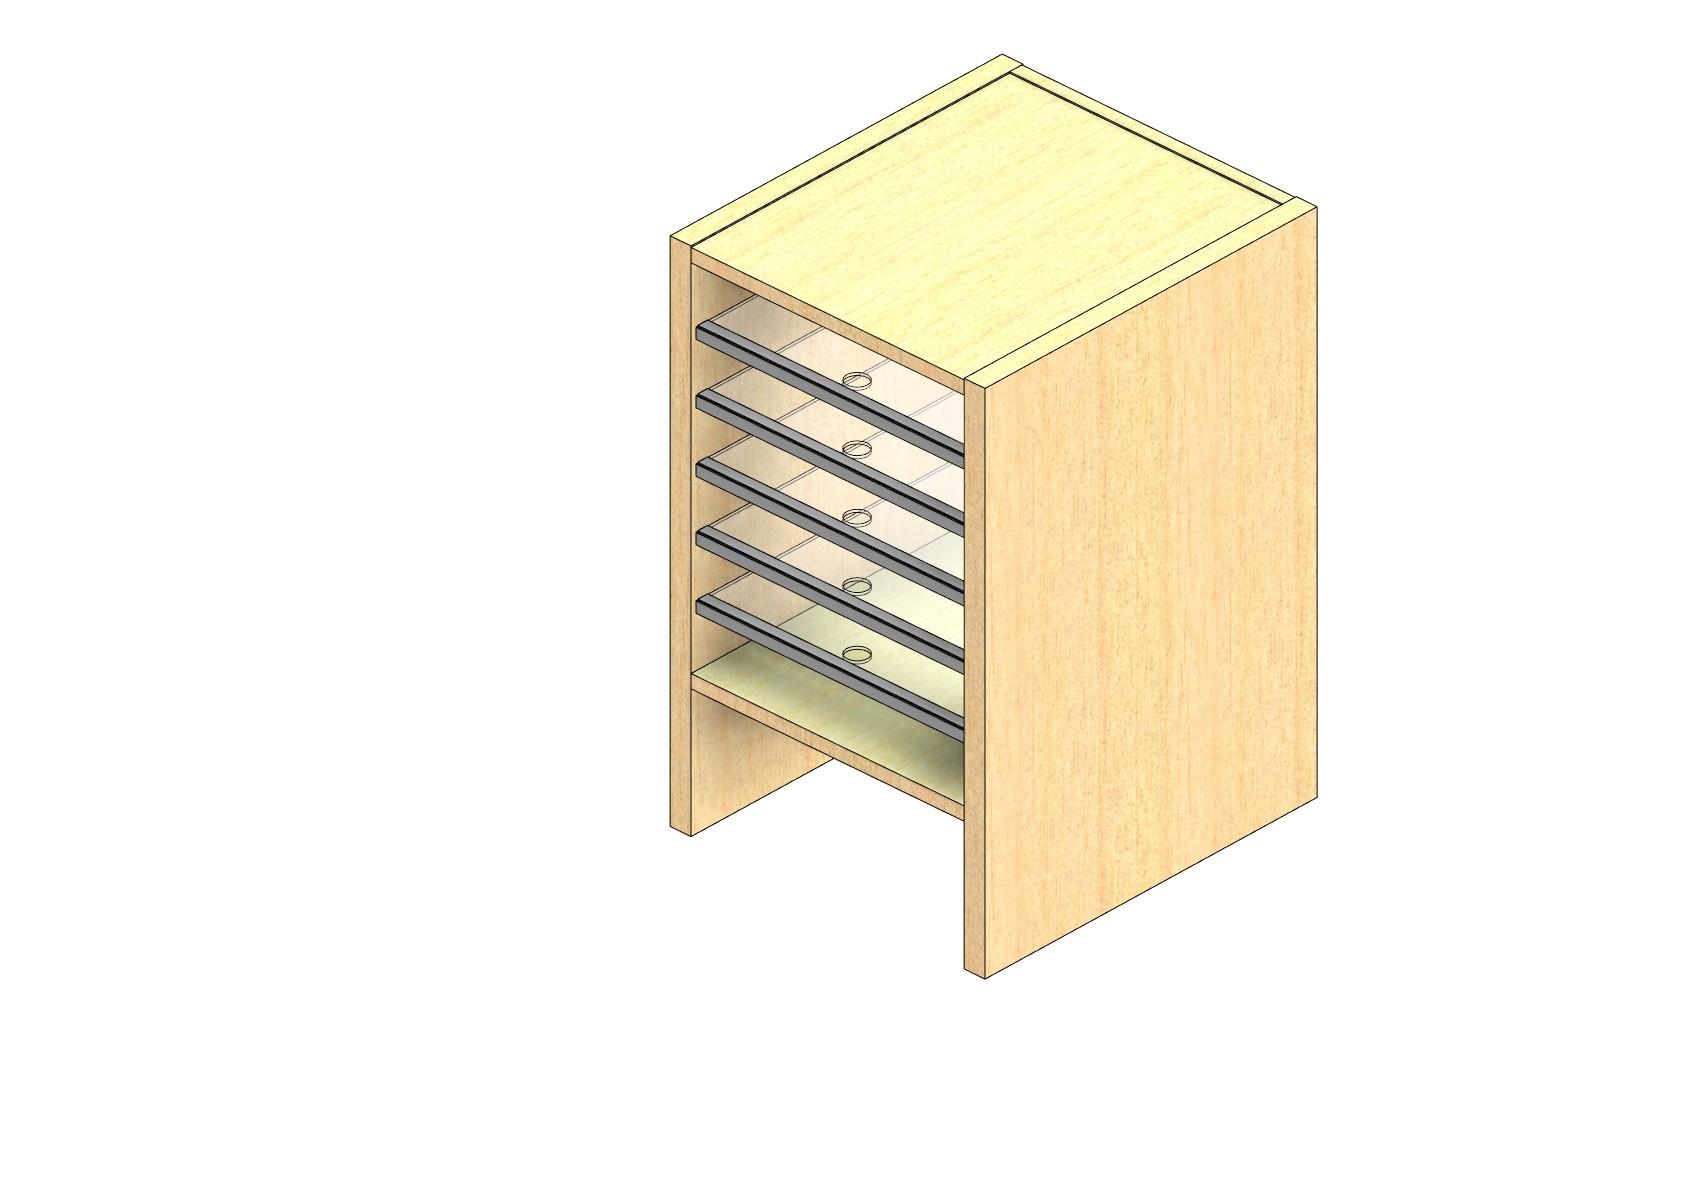 "Oversize Sized Plexi Back Sort Module - 1 Column - 18"" Sorting Height w/ 6"" Riser"